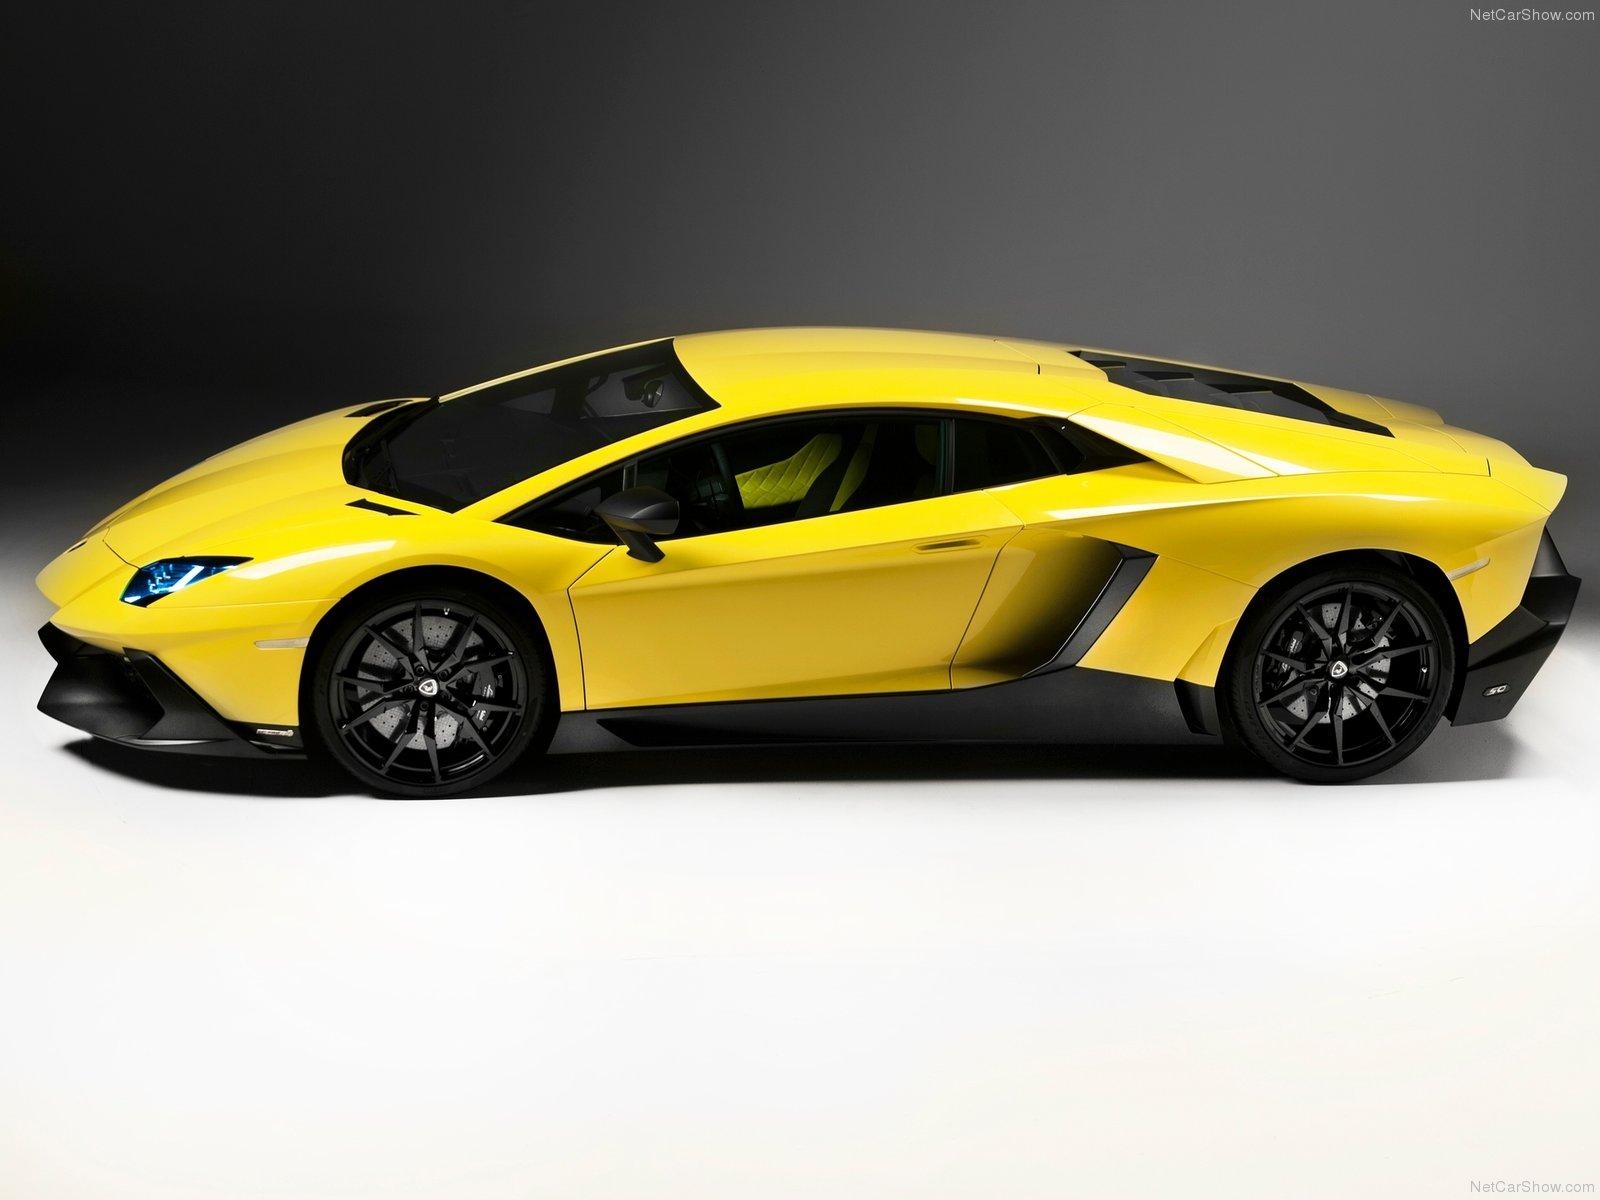 Visiting the Lamborghini Museum in Sant Agata Bolognese Italy